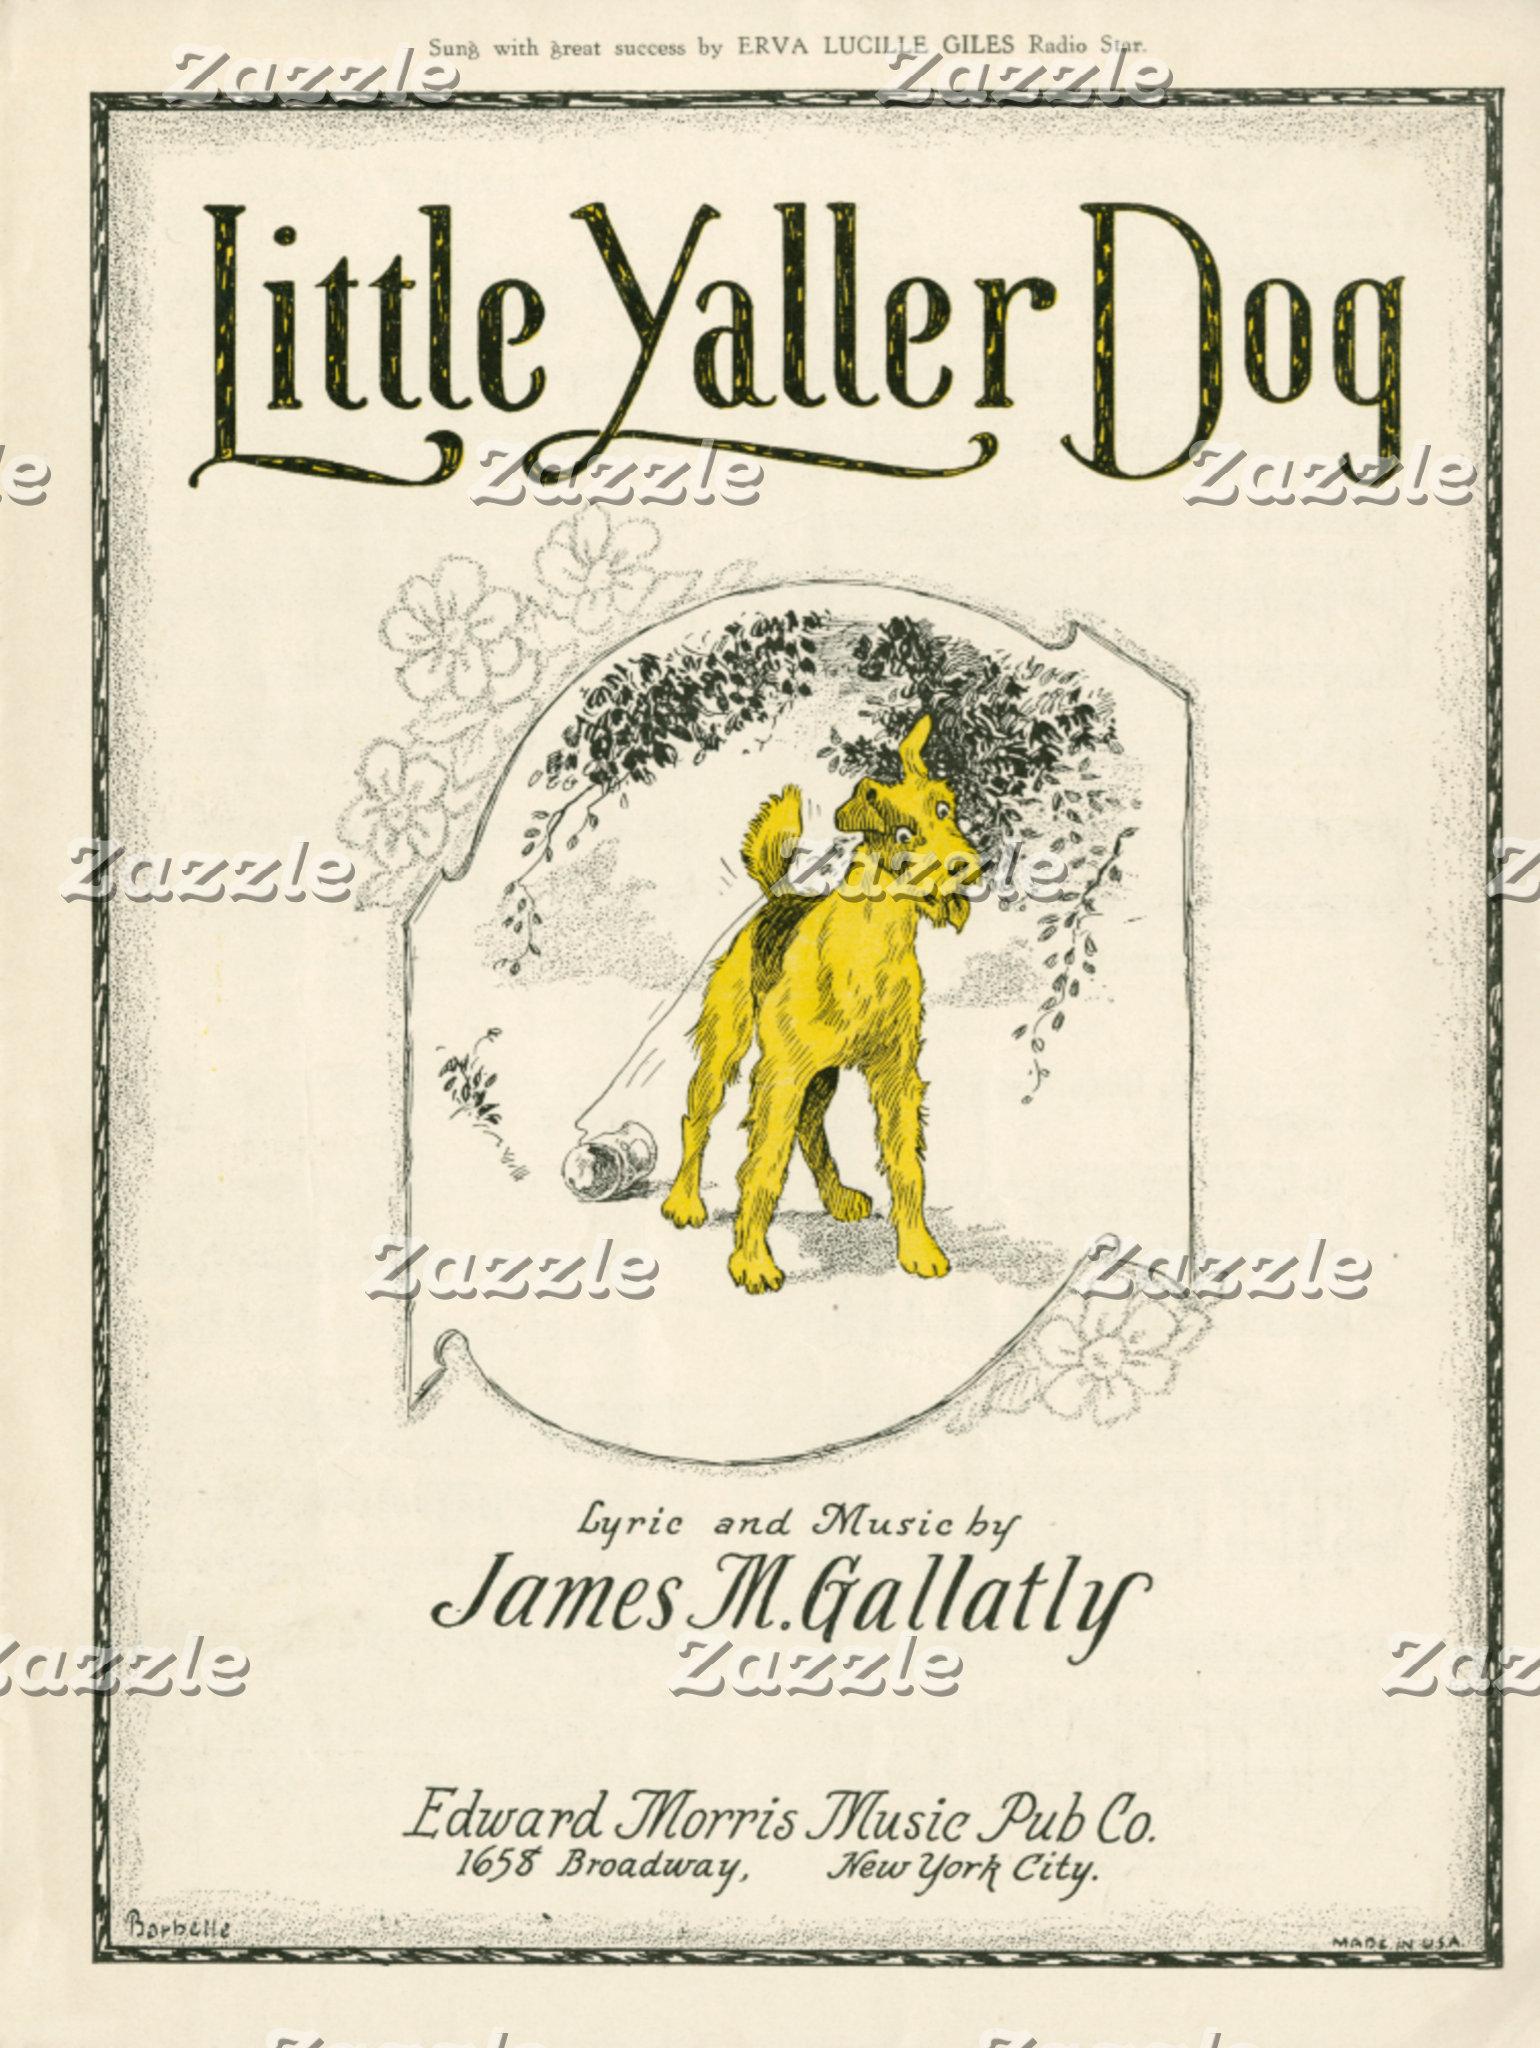 Little Yaller Dog